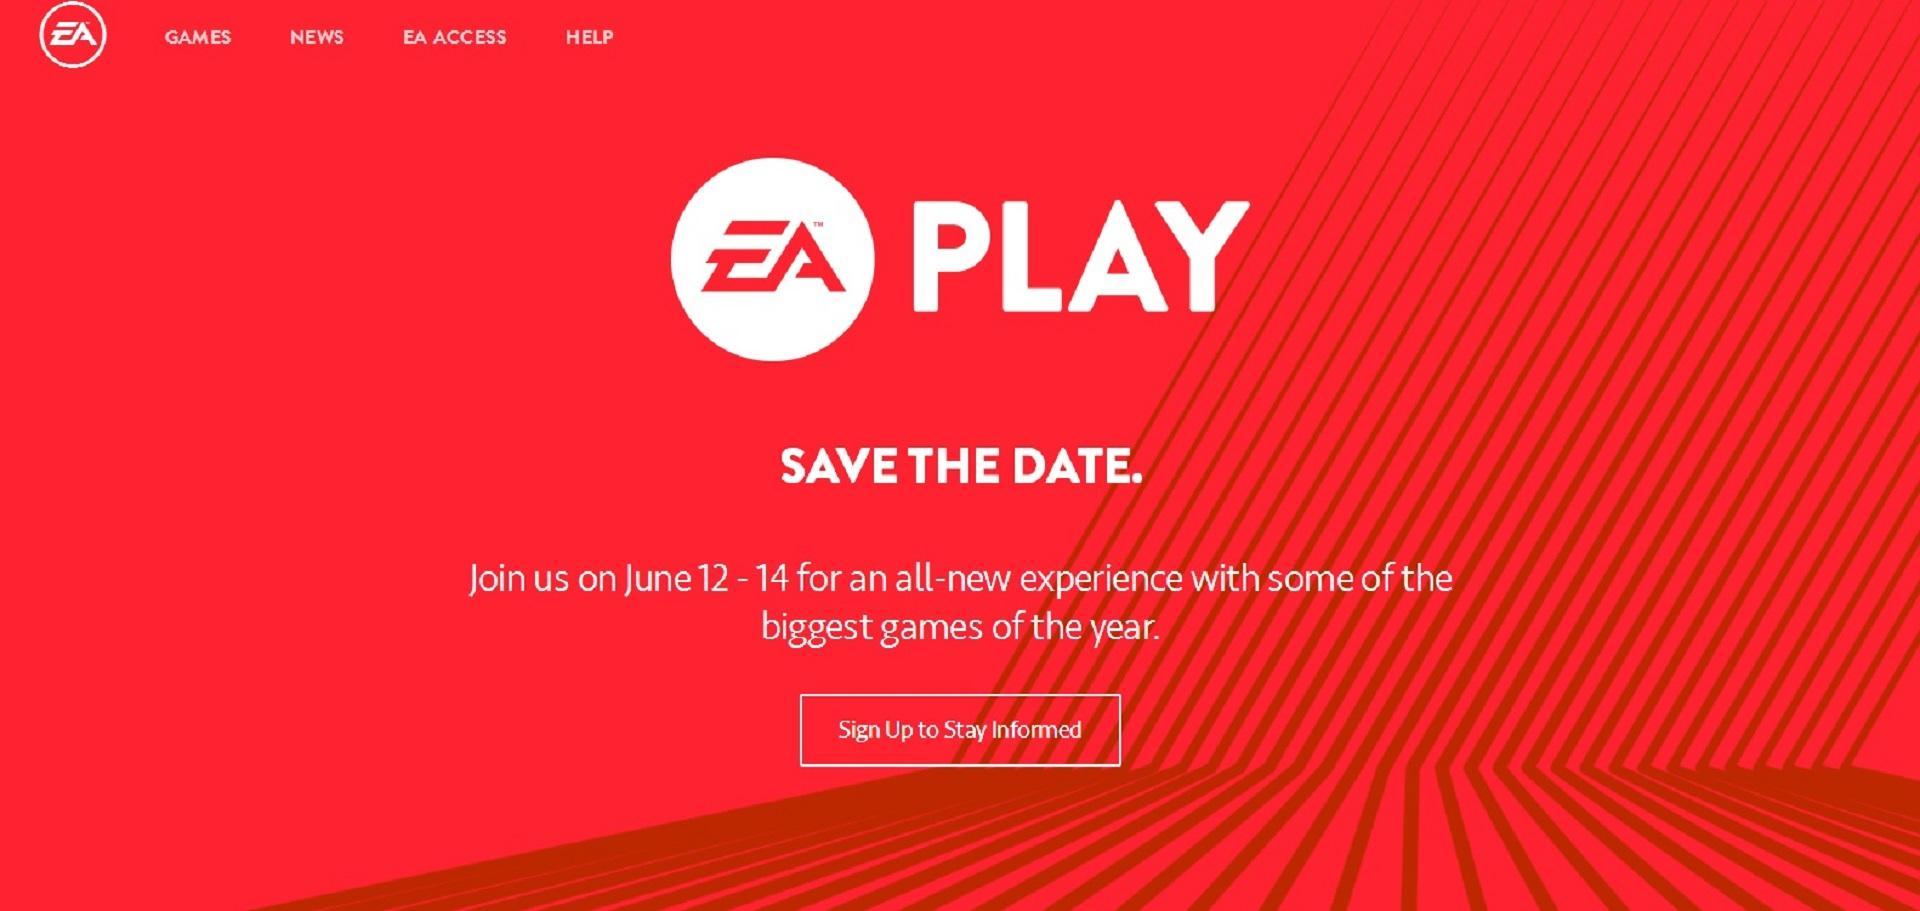 E3 2016 | EA sẽ tổ chức sự kiện riêng, không tham gia E3 - Tin Game